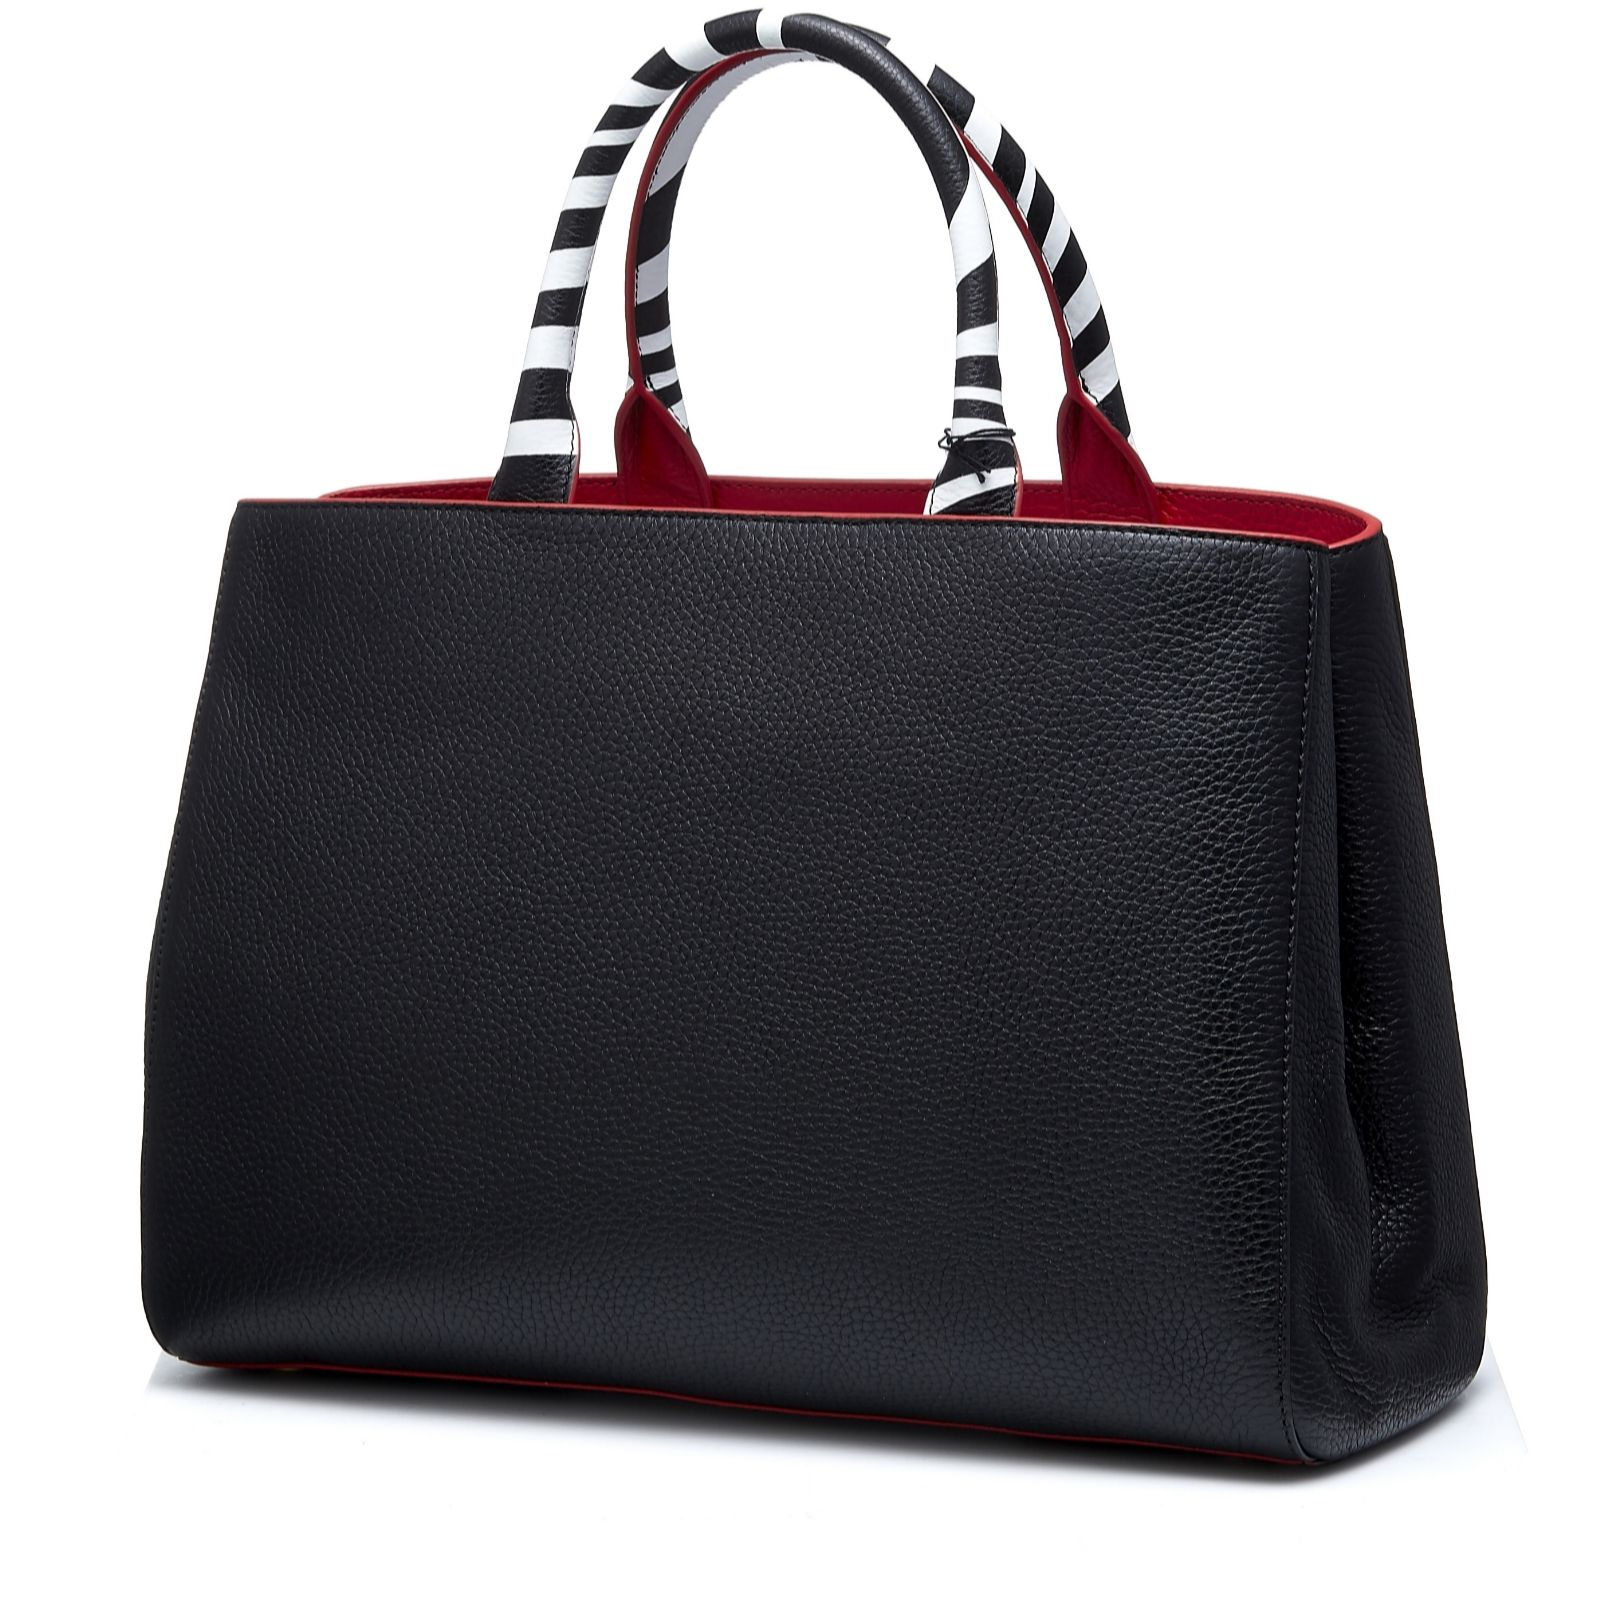 7aff738996a3c Lulu Guinness Amelia Triple Tone Tote Bag - QVC UK